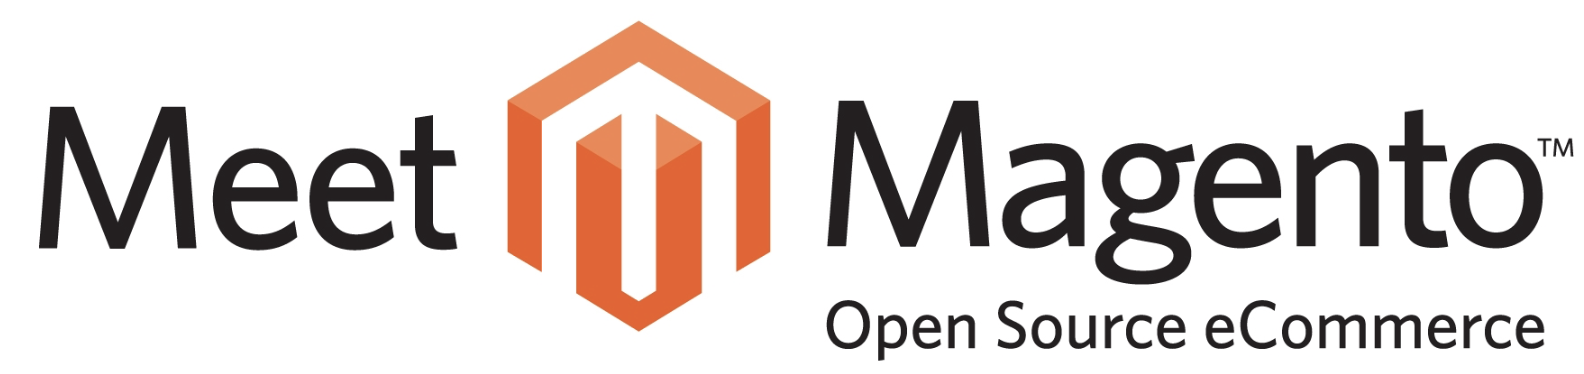 Die besten Ecommerce Konferenzen Meet Magento